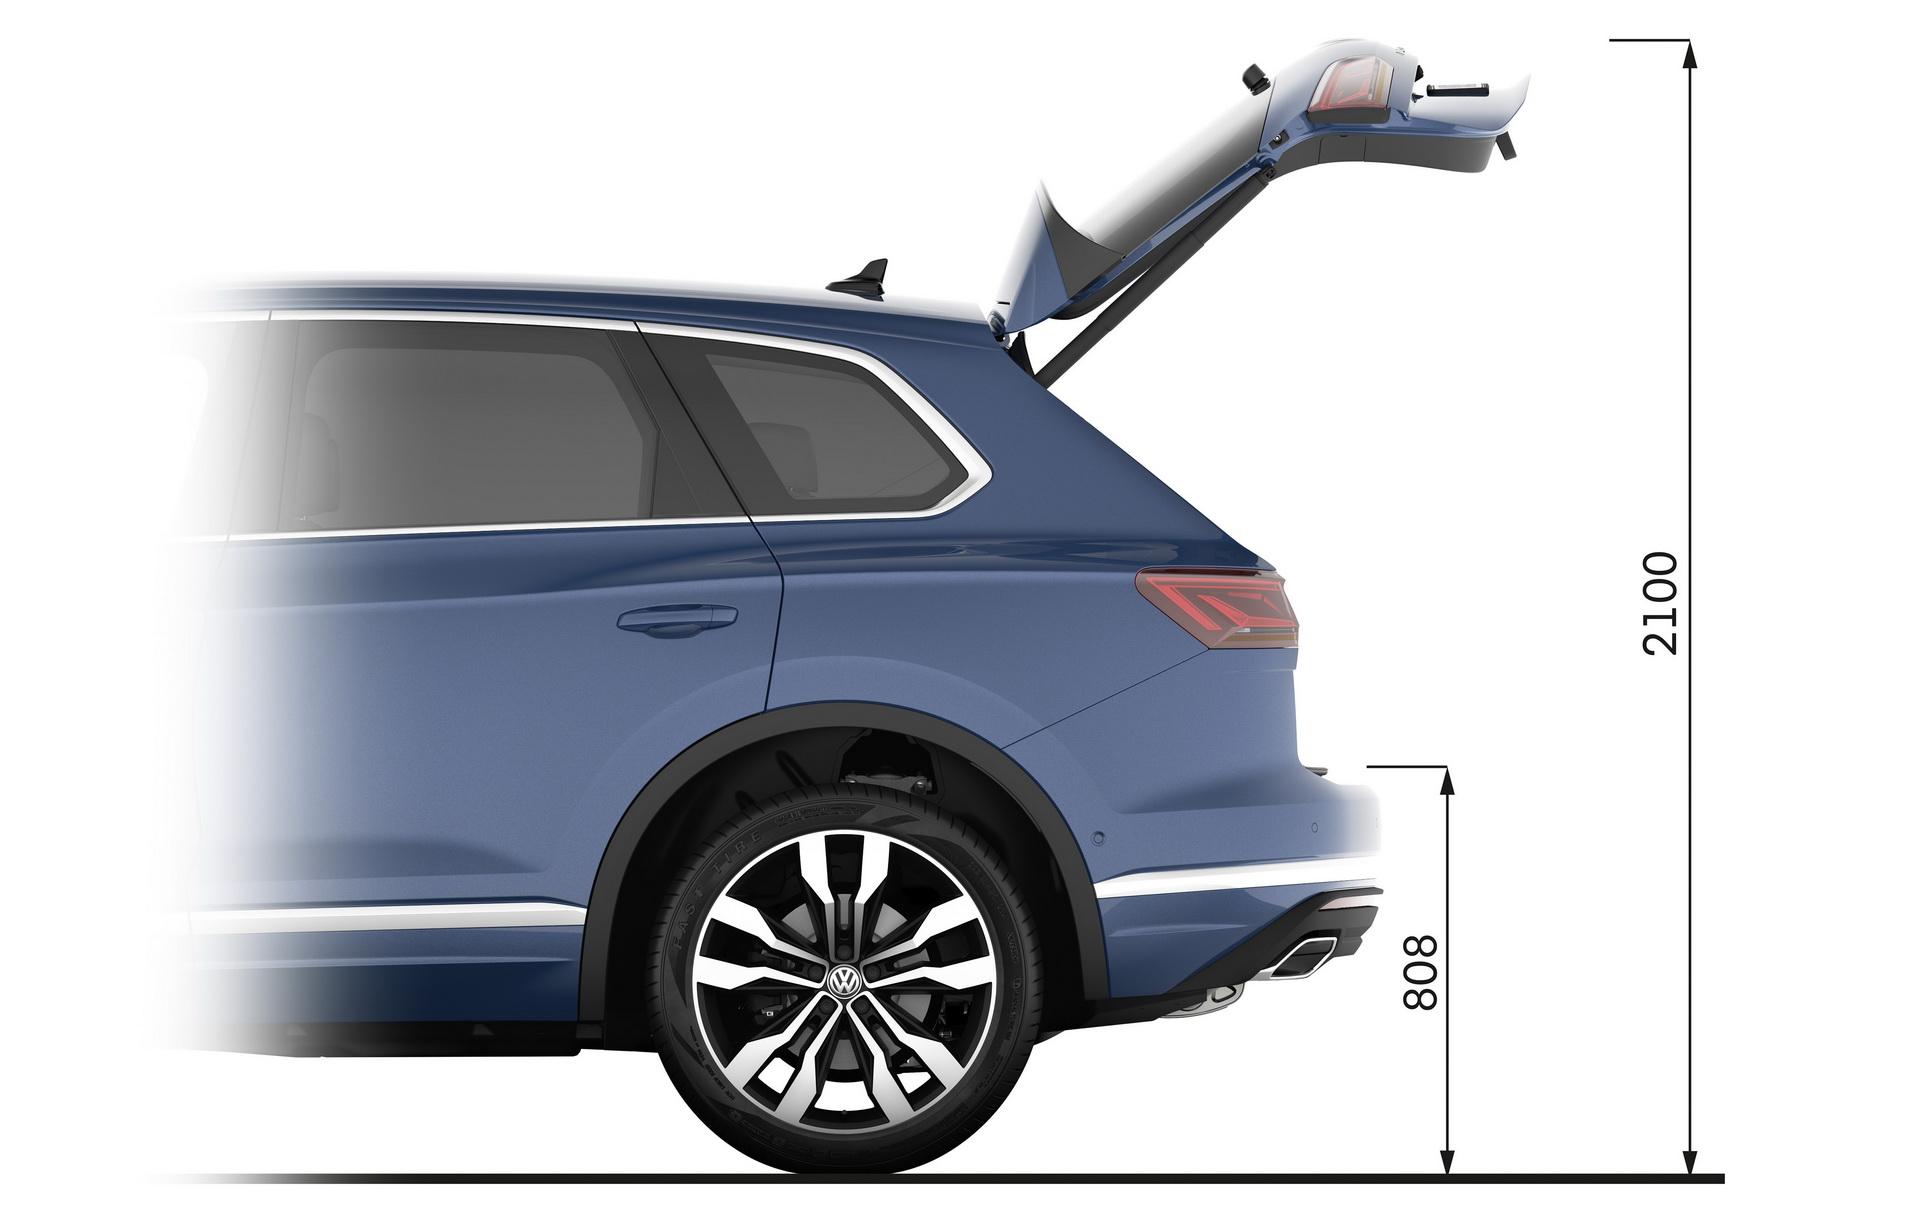 Volkswagen Touareg 2018 (42)